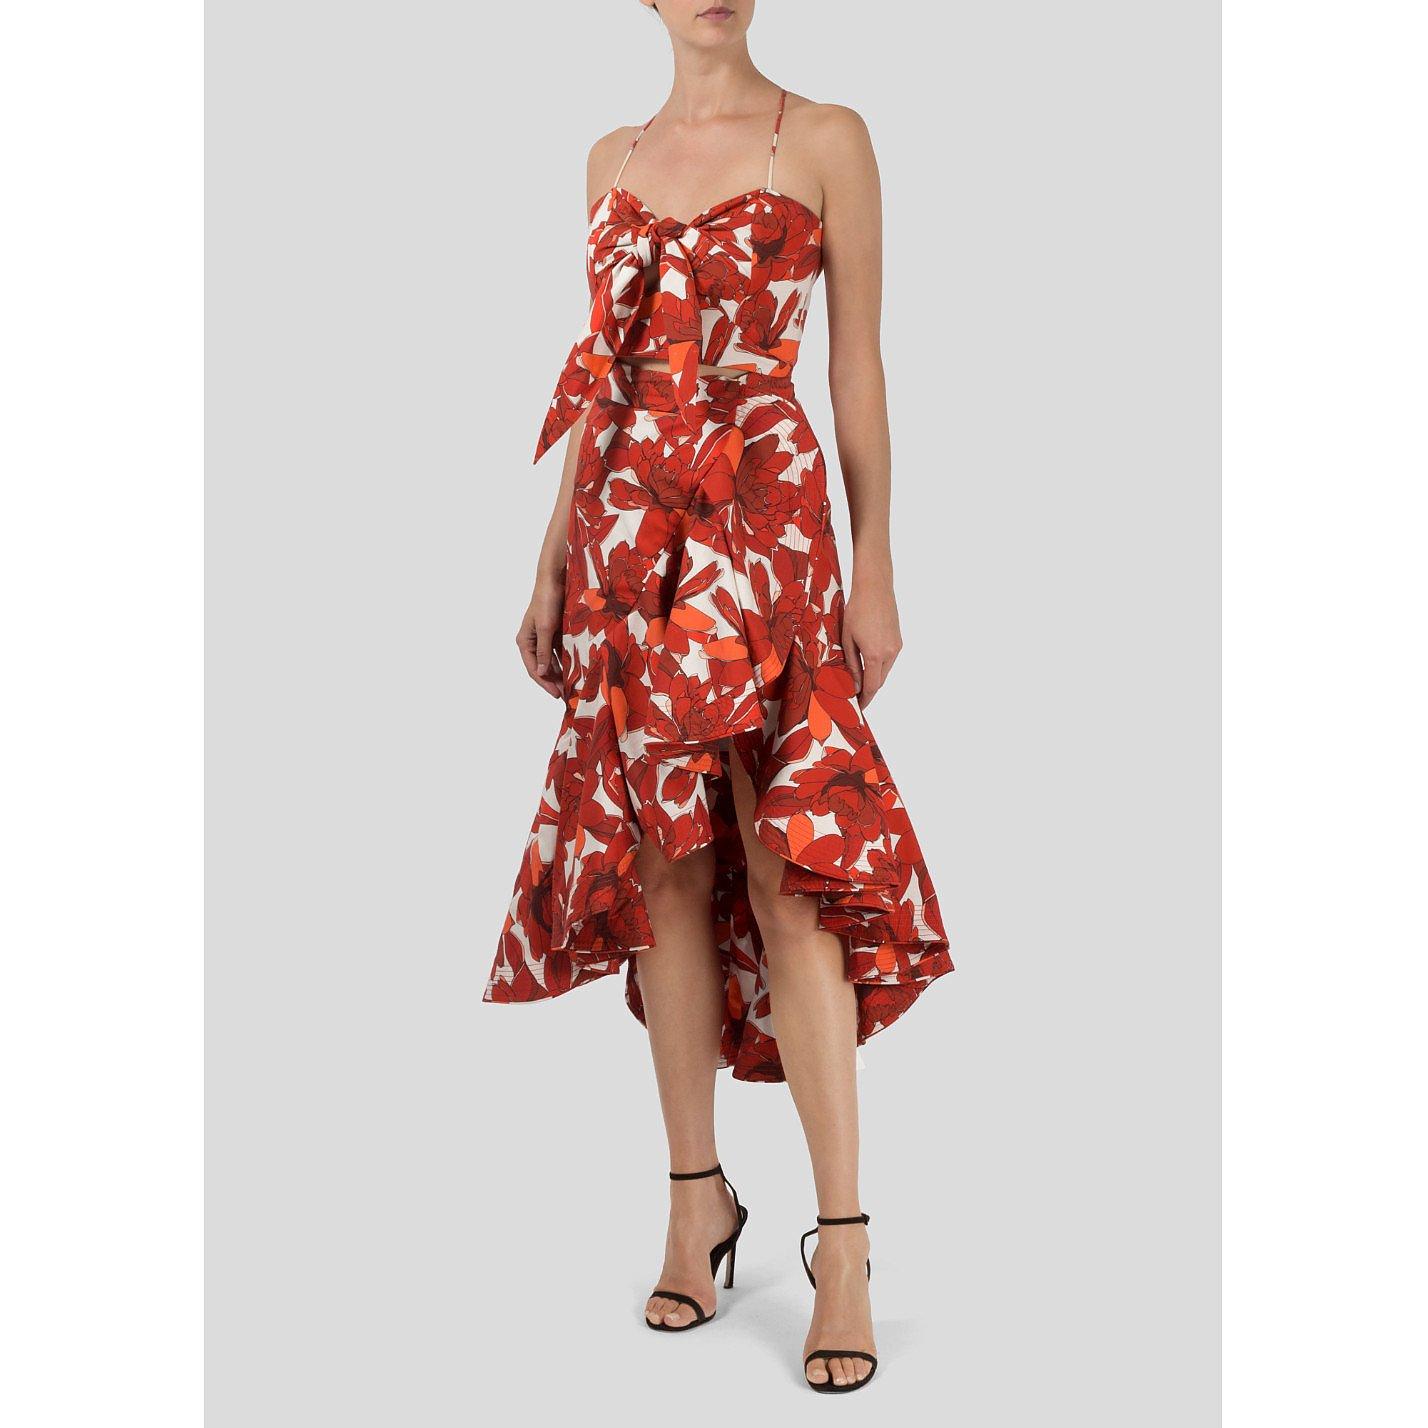 Johanna Ortiz Poppy Print Skirt and Top Set